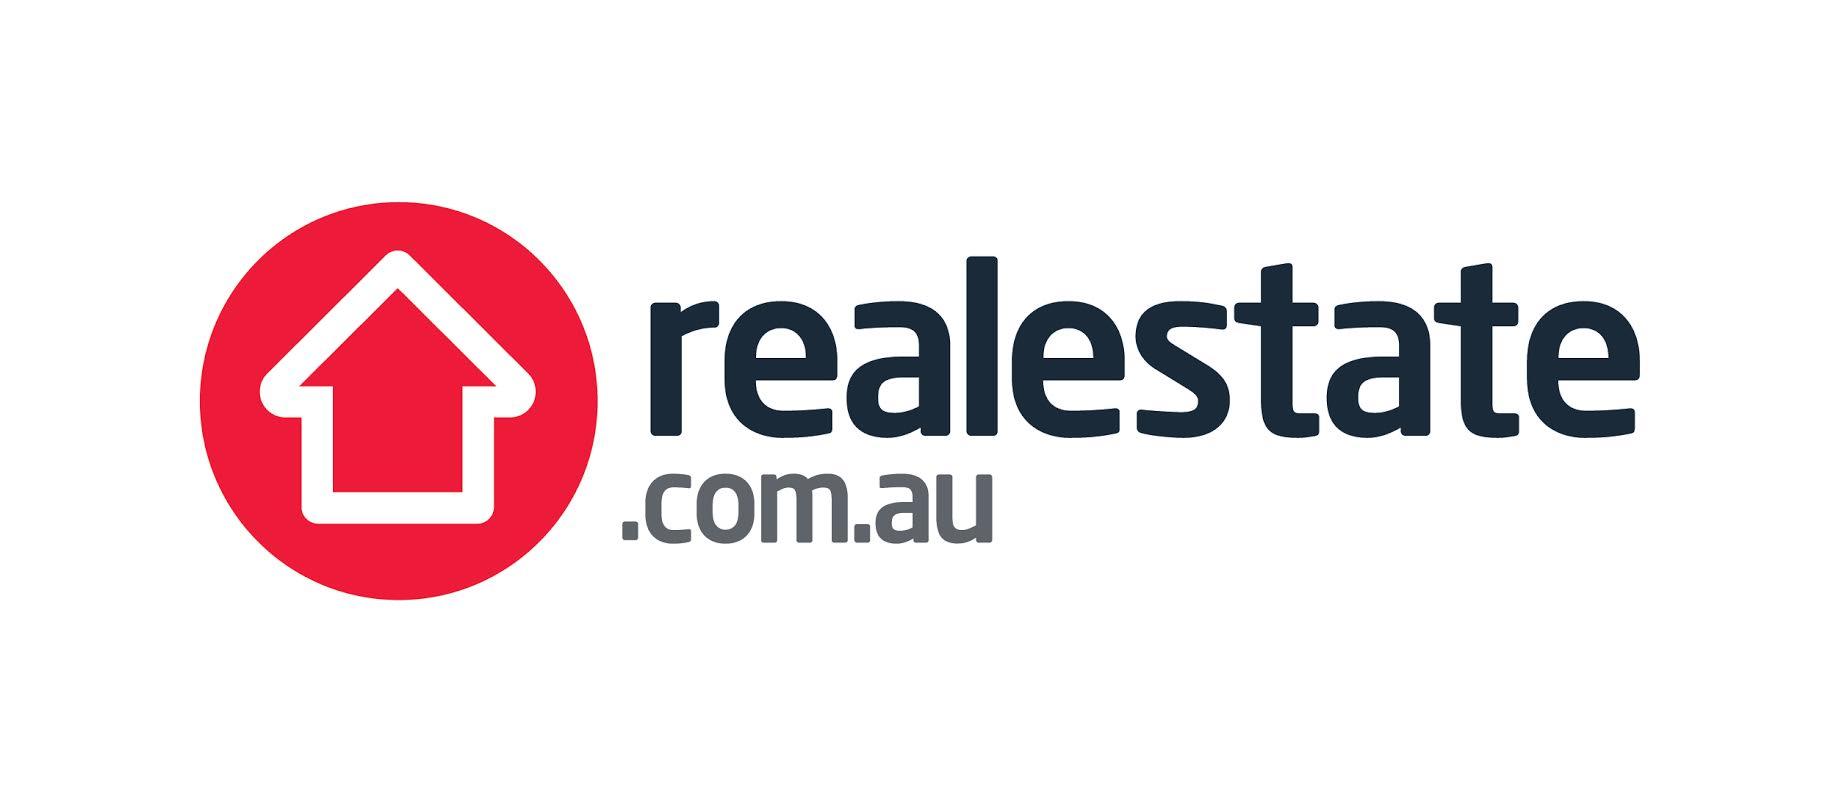 realestate-logo-3.jpg